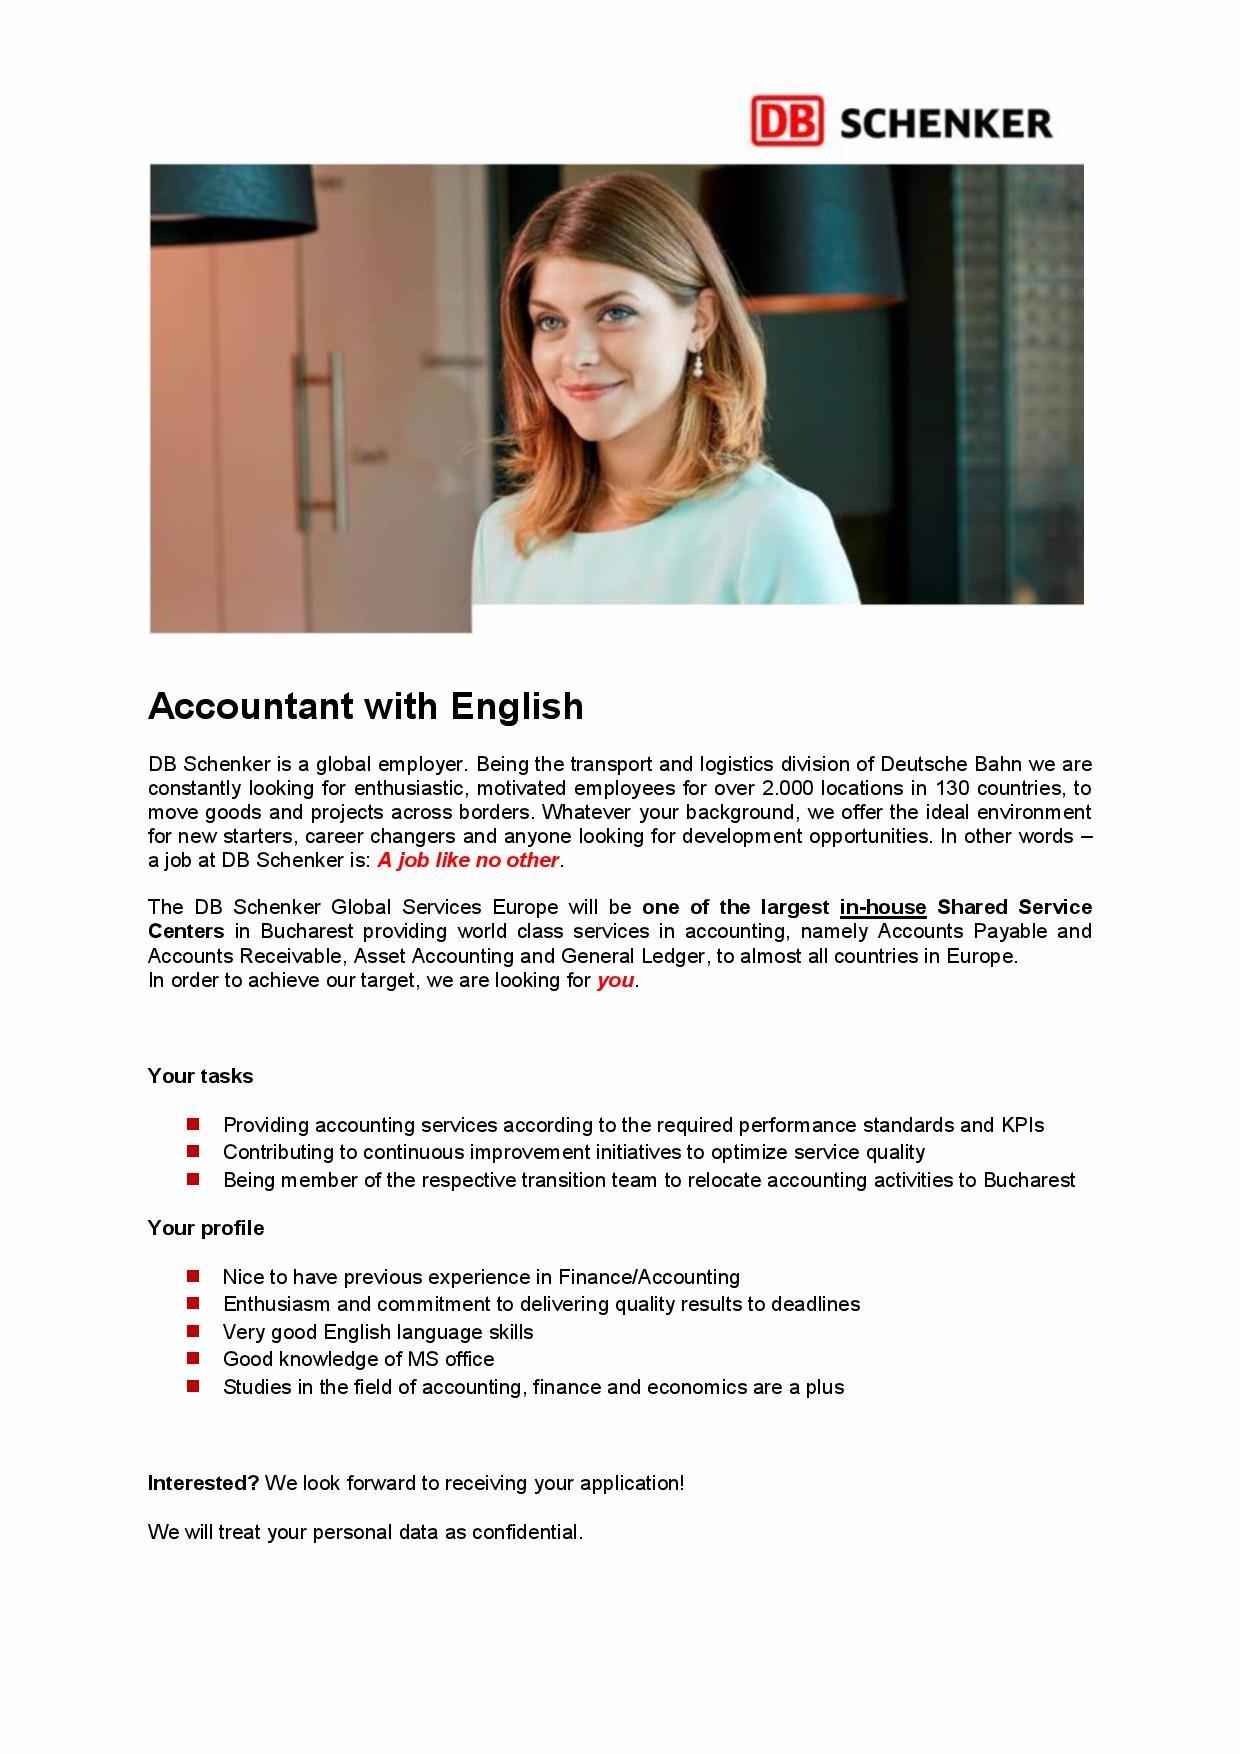 Job Add Accountant with English-page-001 (1)